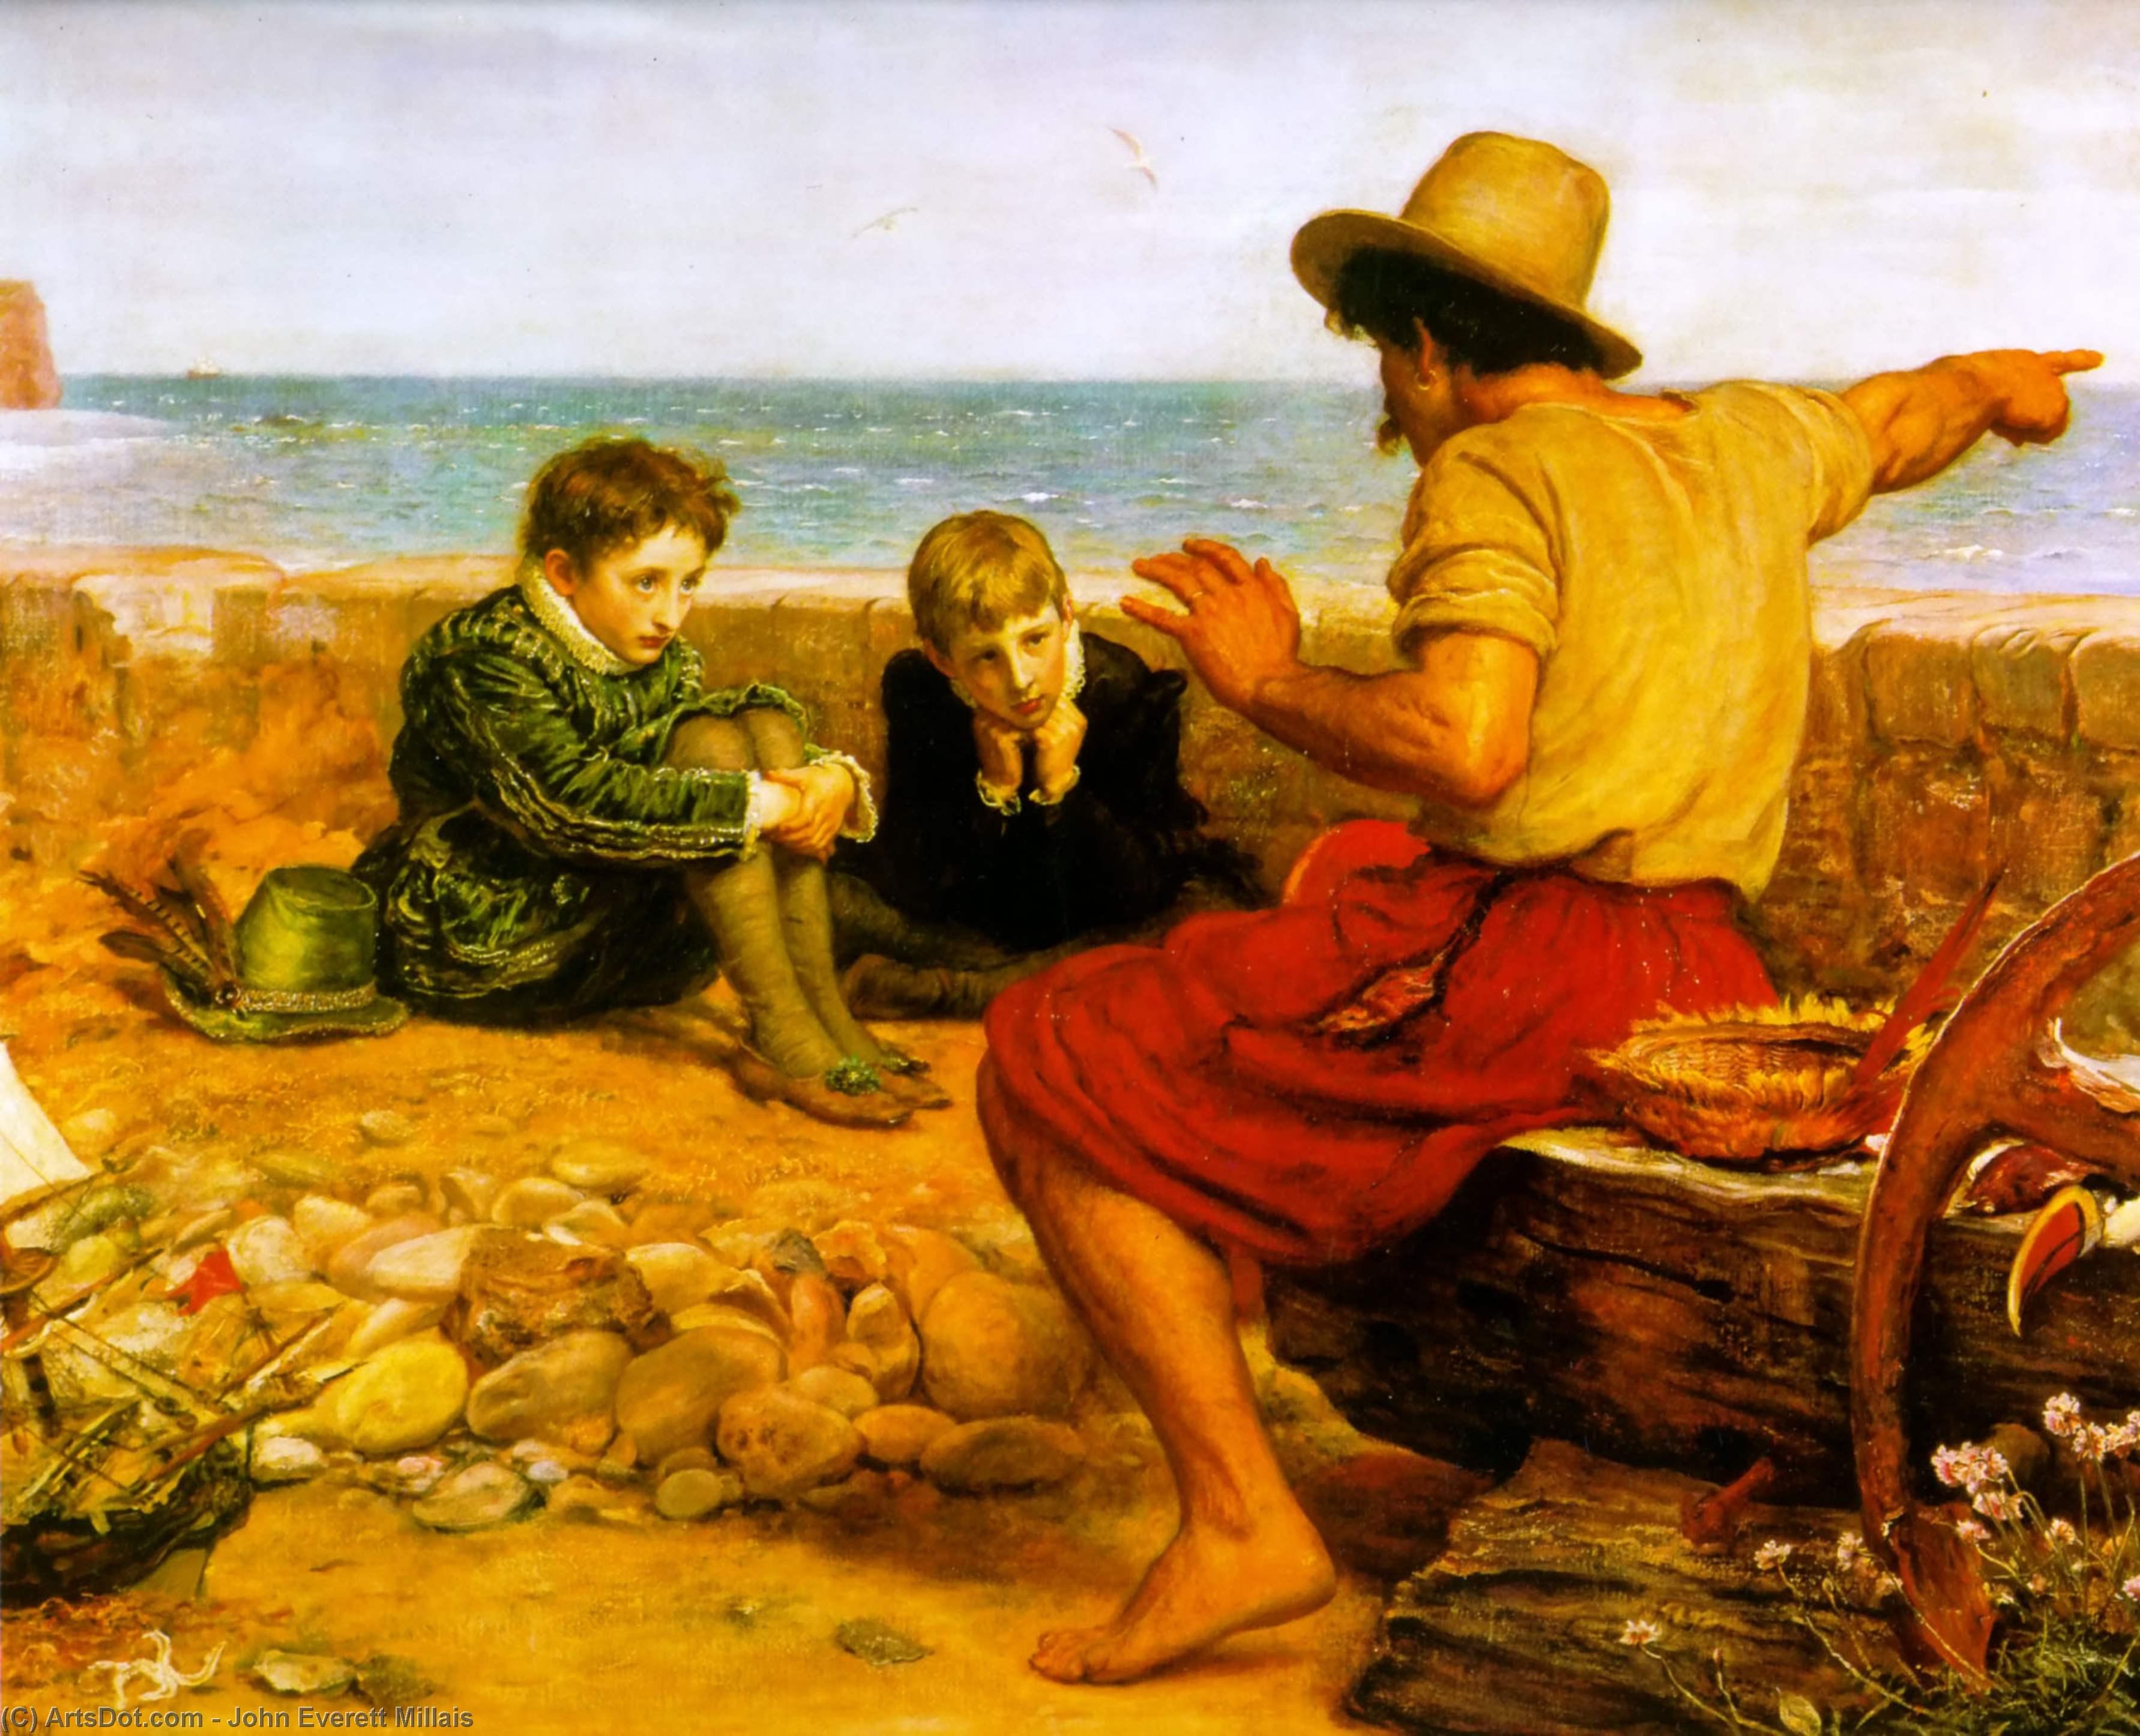 Wikioo.org - The Encyclopedia of Fine Arts - Painting, Artwork by John Everett Millais - The Boyhood of Raleigh